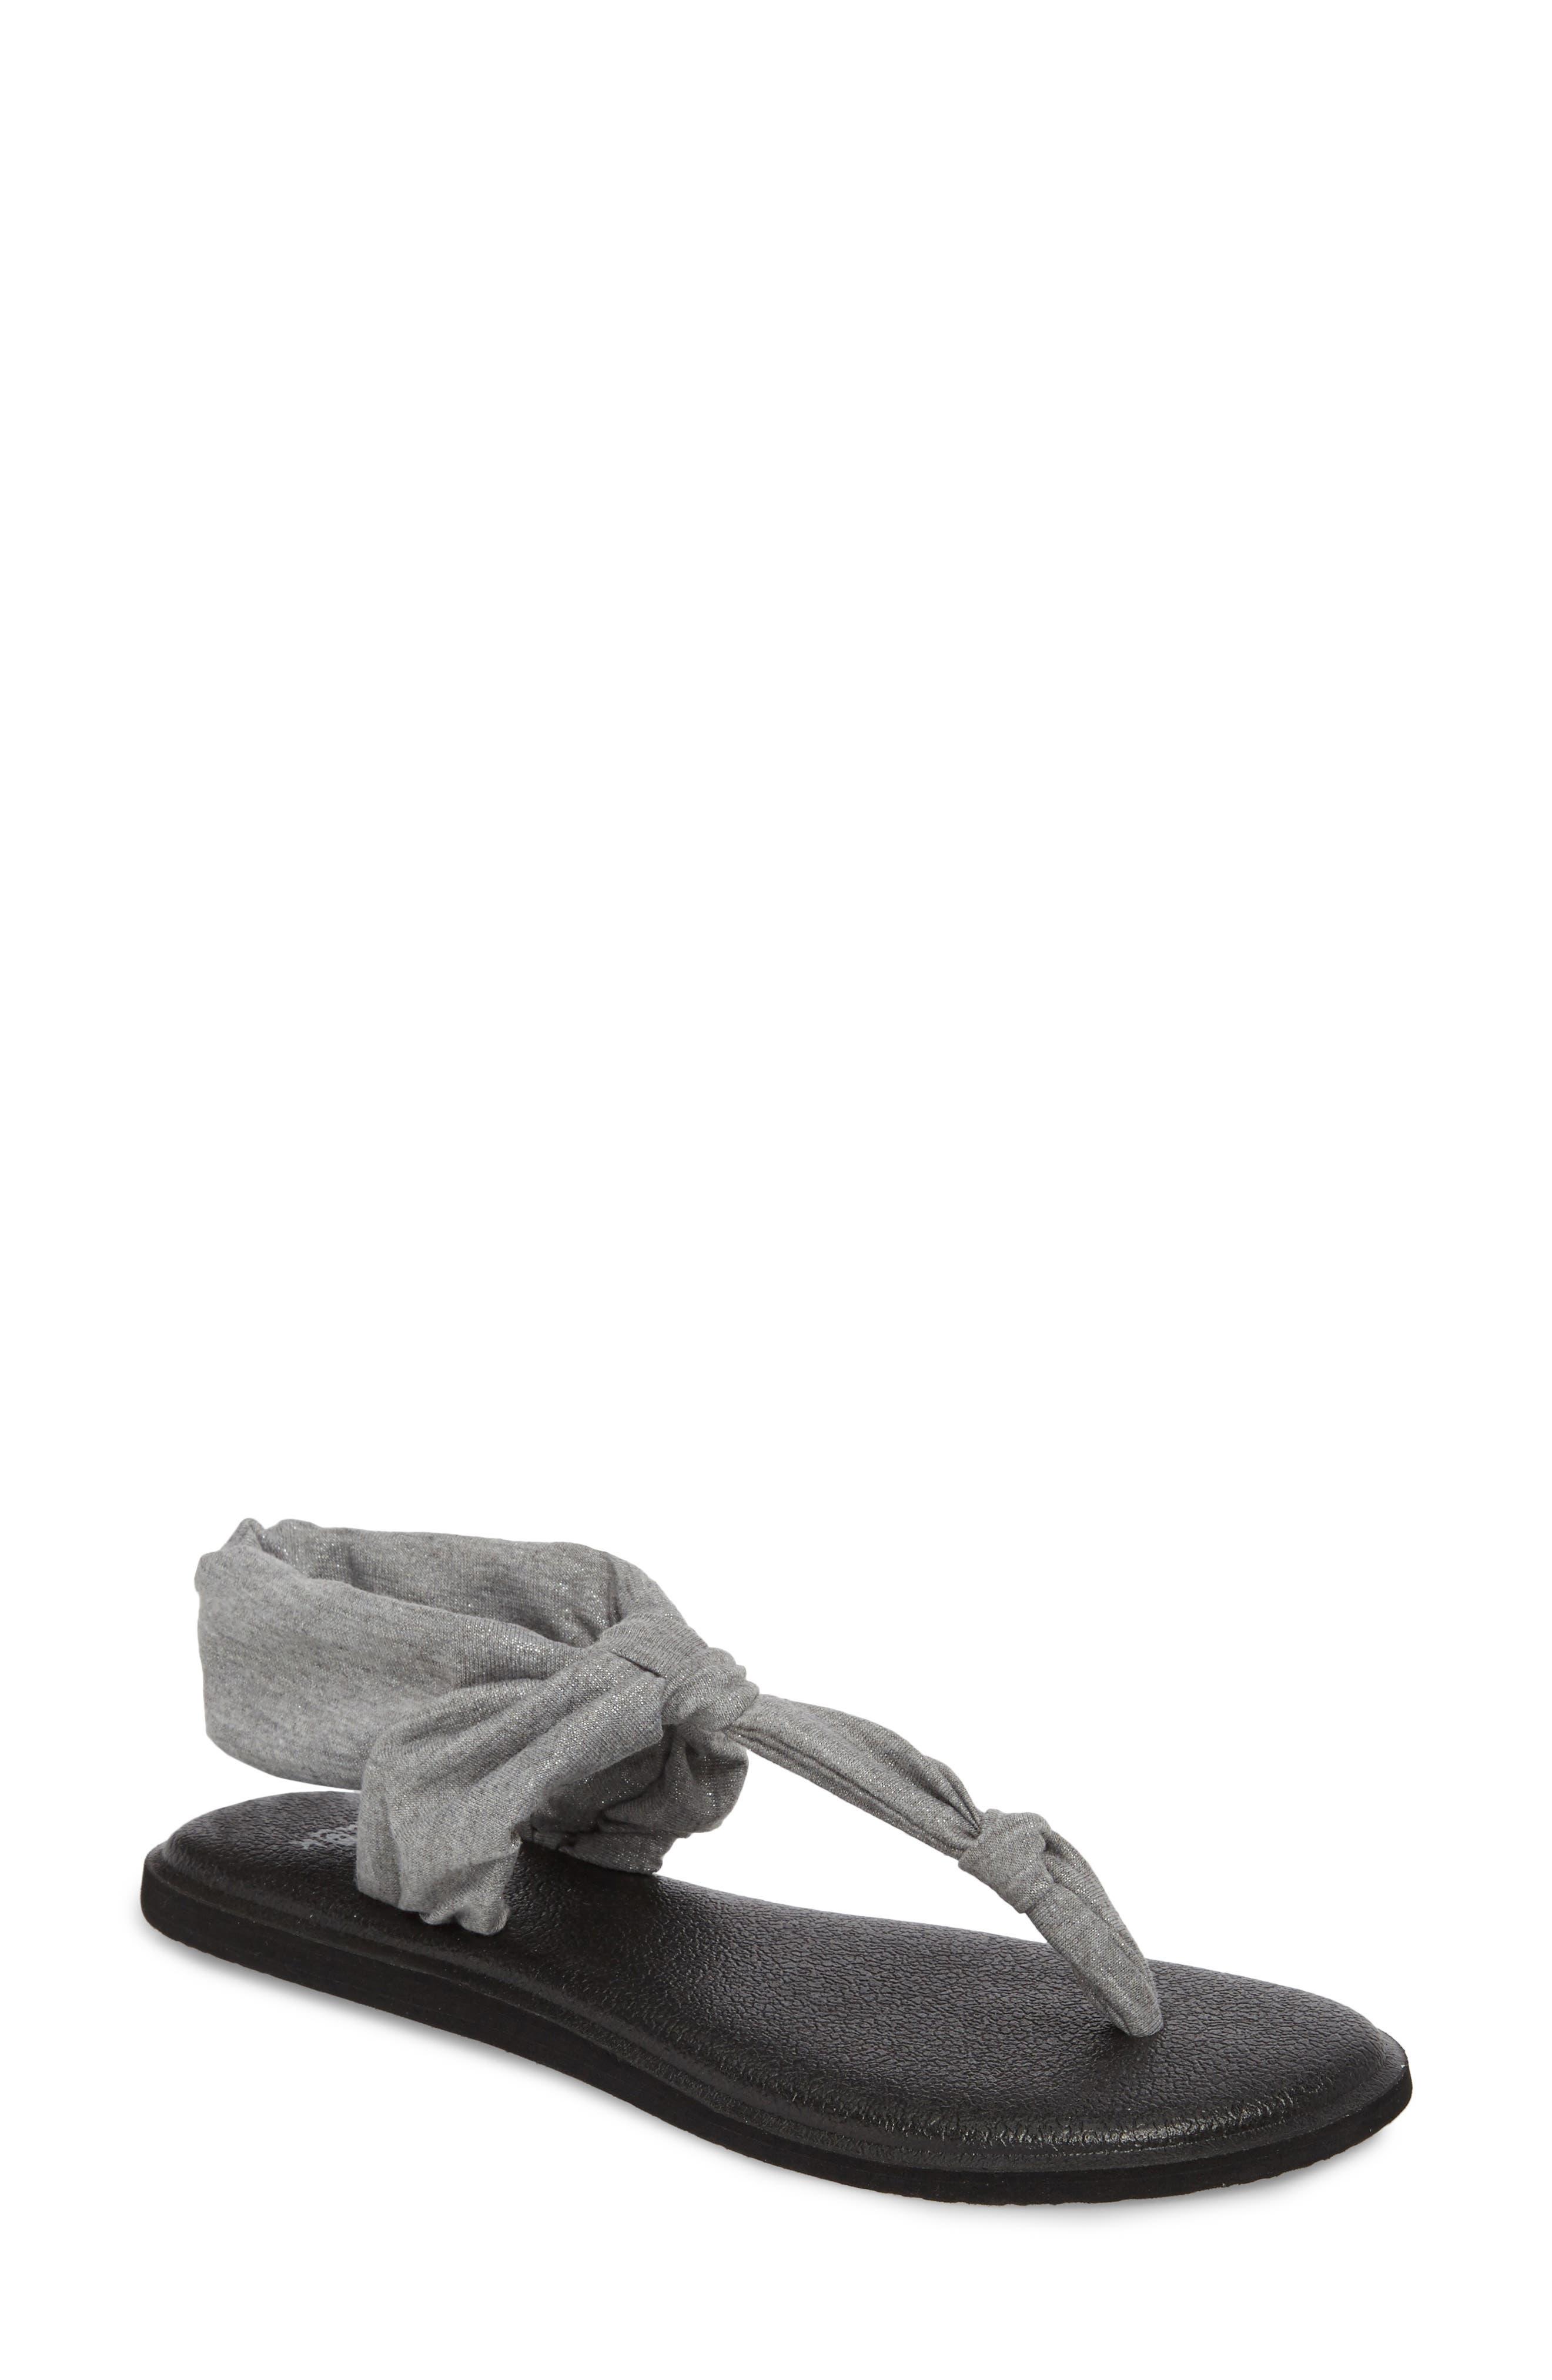 flip sanuk teva wms zoeyteal outdoor yoga select options ii metallic joy s mat women womens product mats specialty shop flop mush arcadian